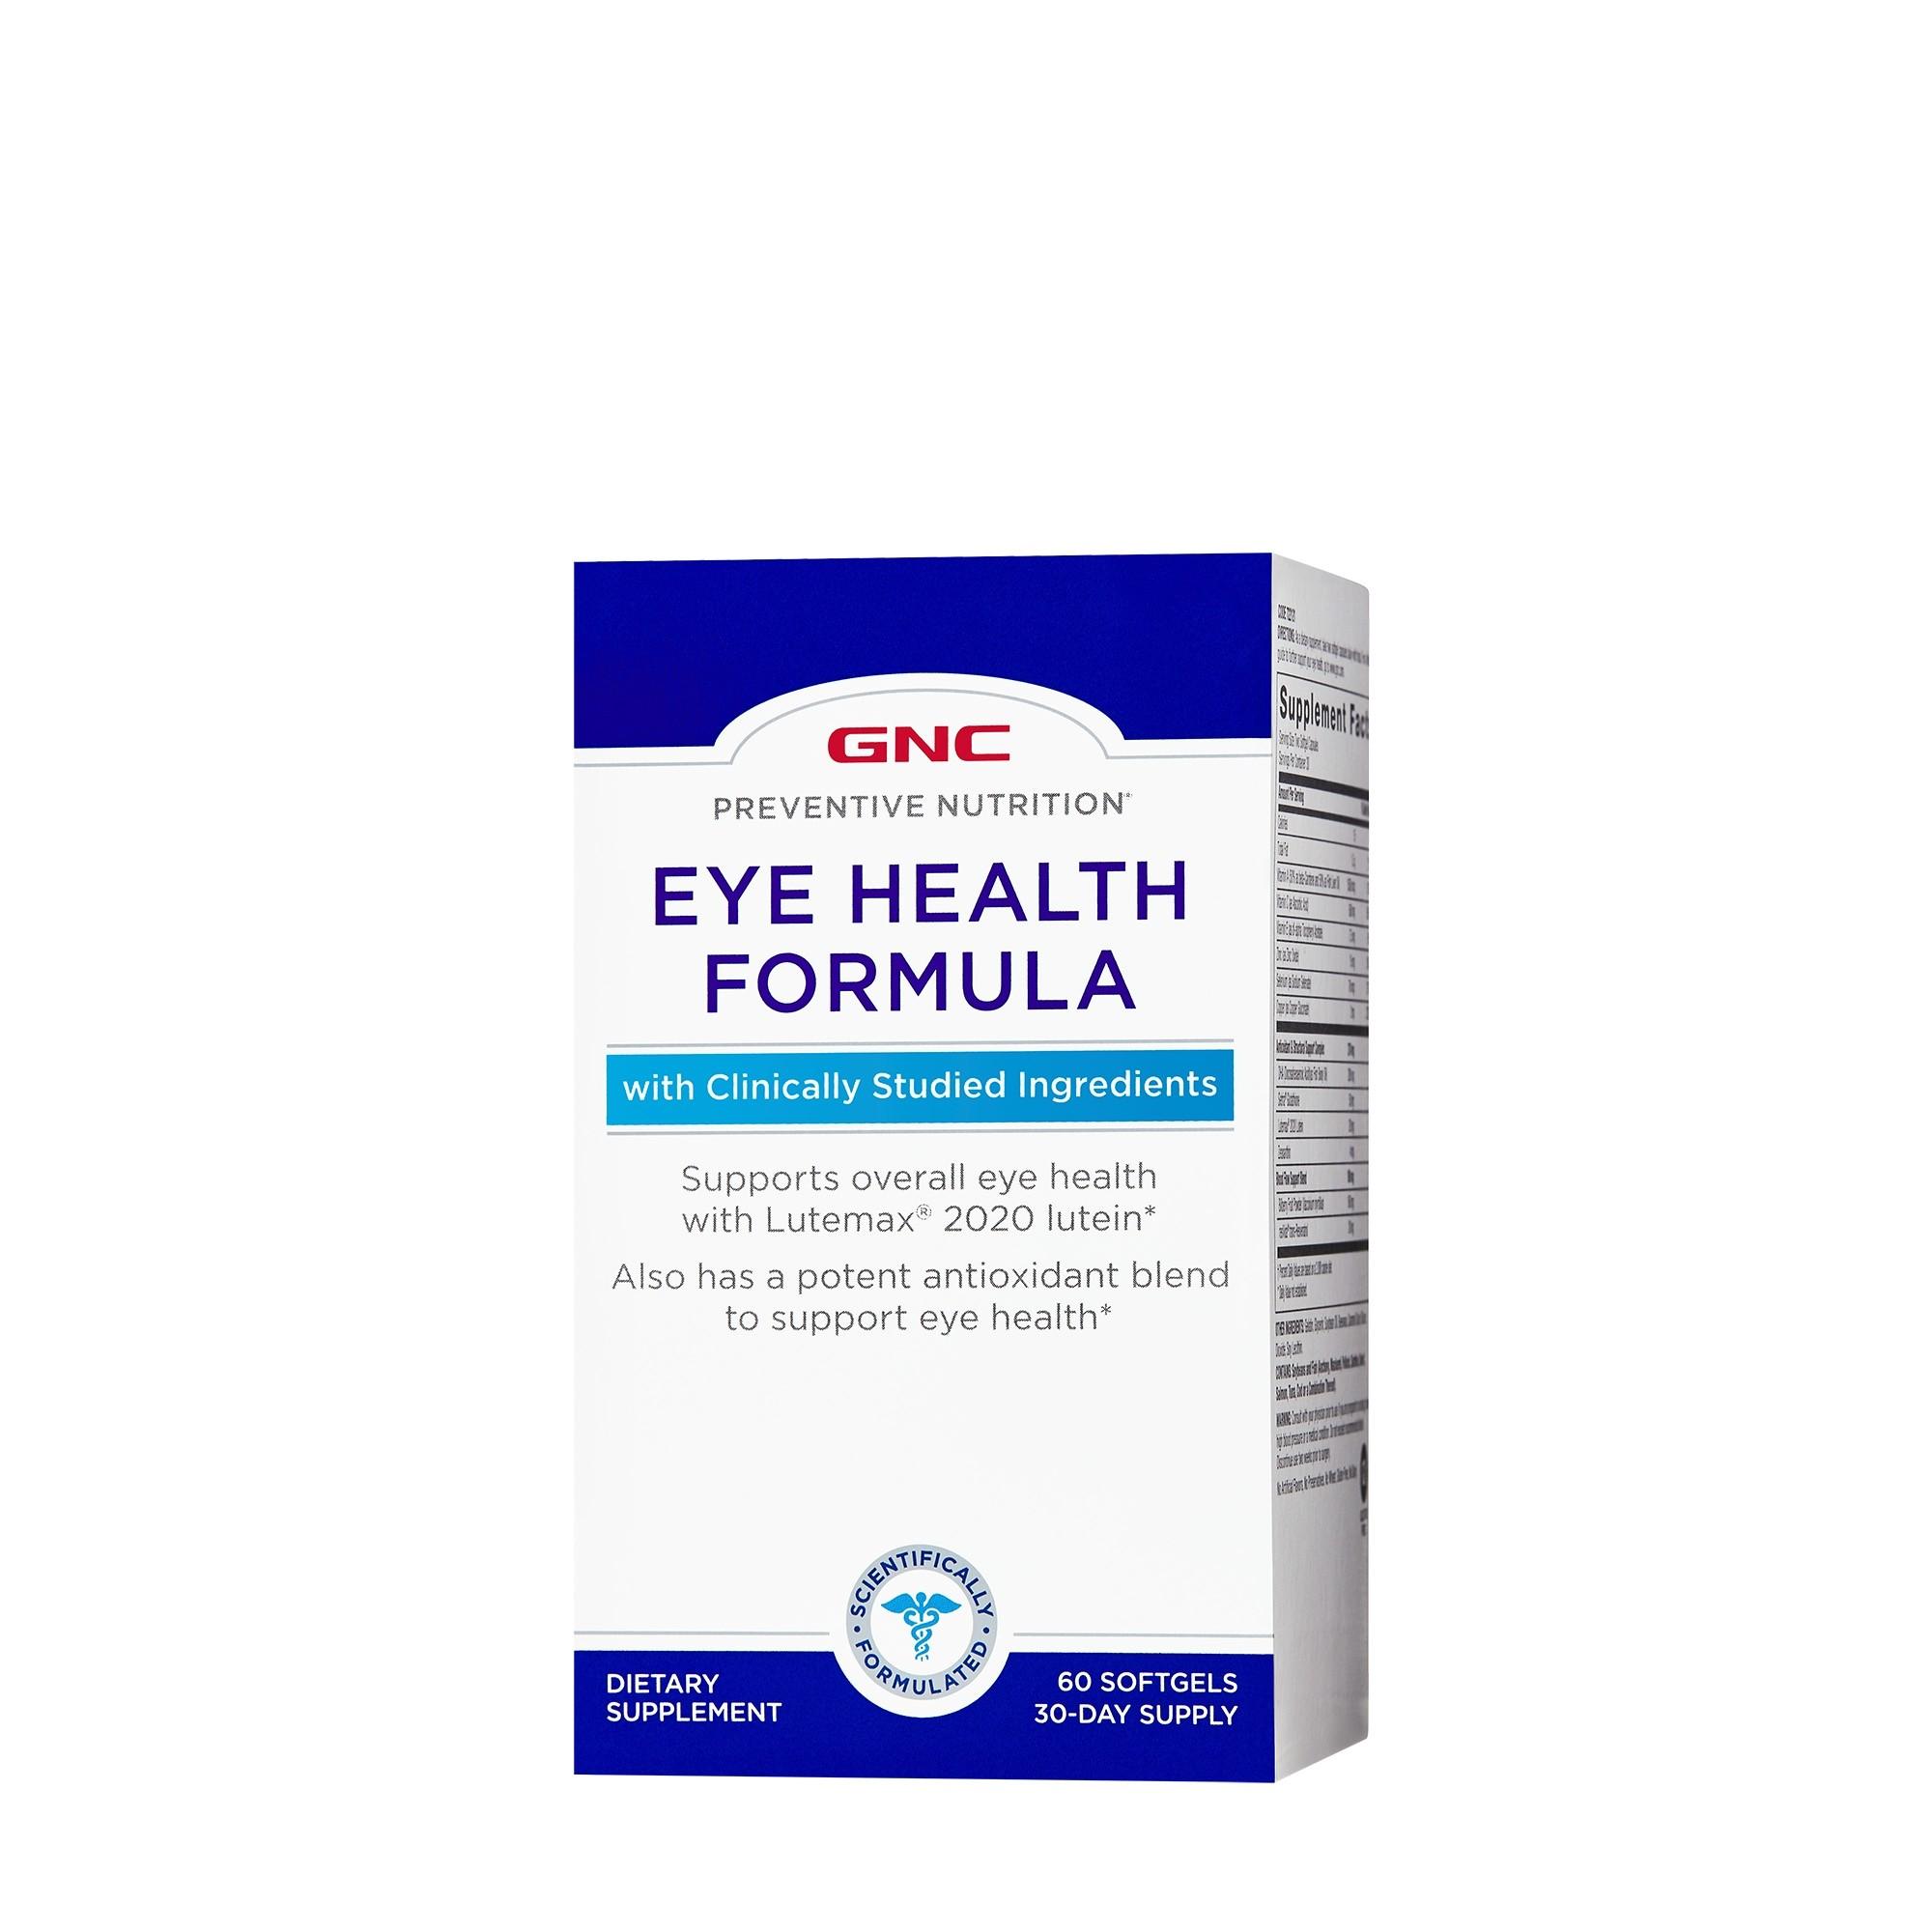 GNC Preventive Nutrition Eye Health, Formula Pentru Sanatatea Ochilor, 60 cps